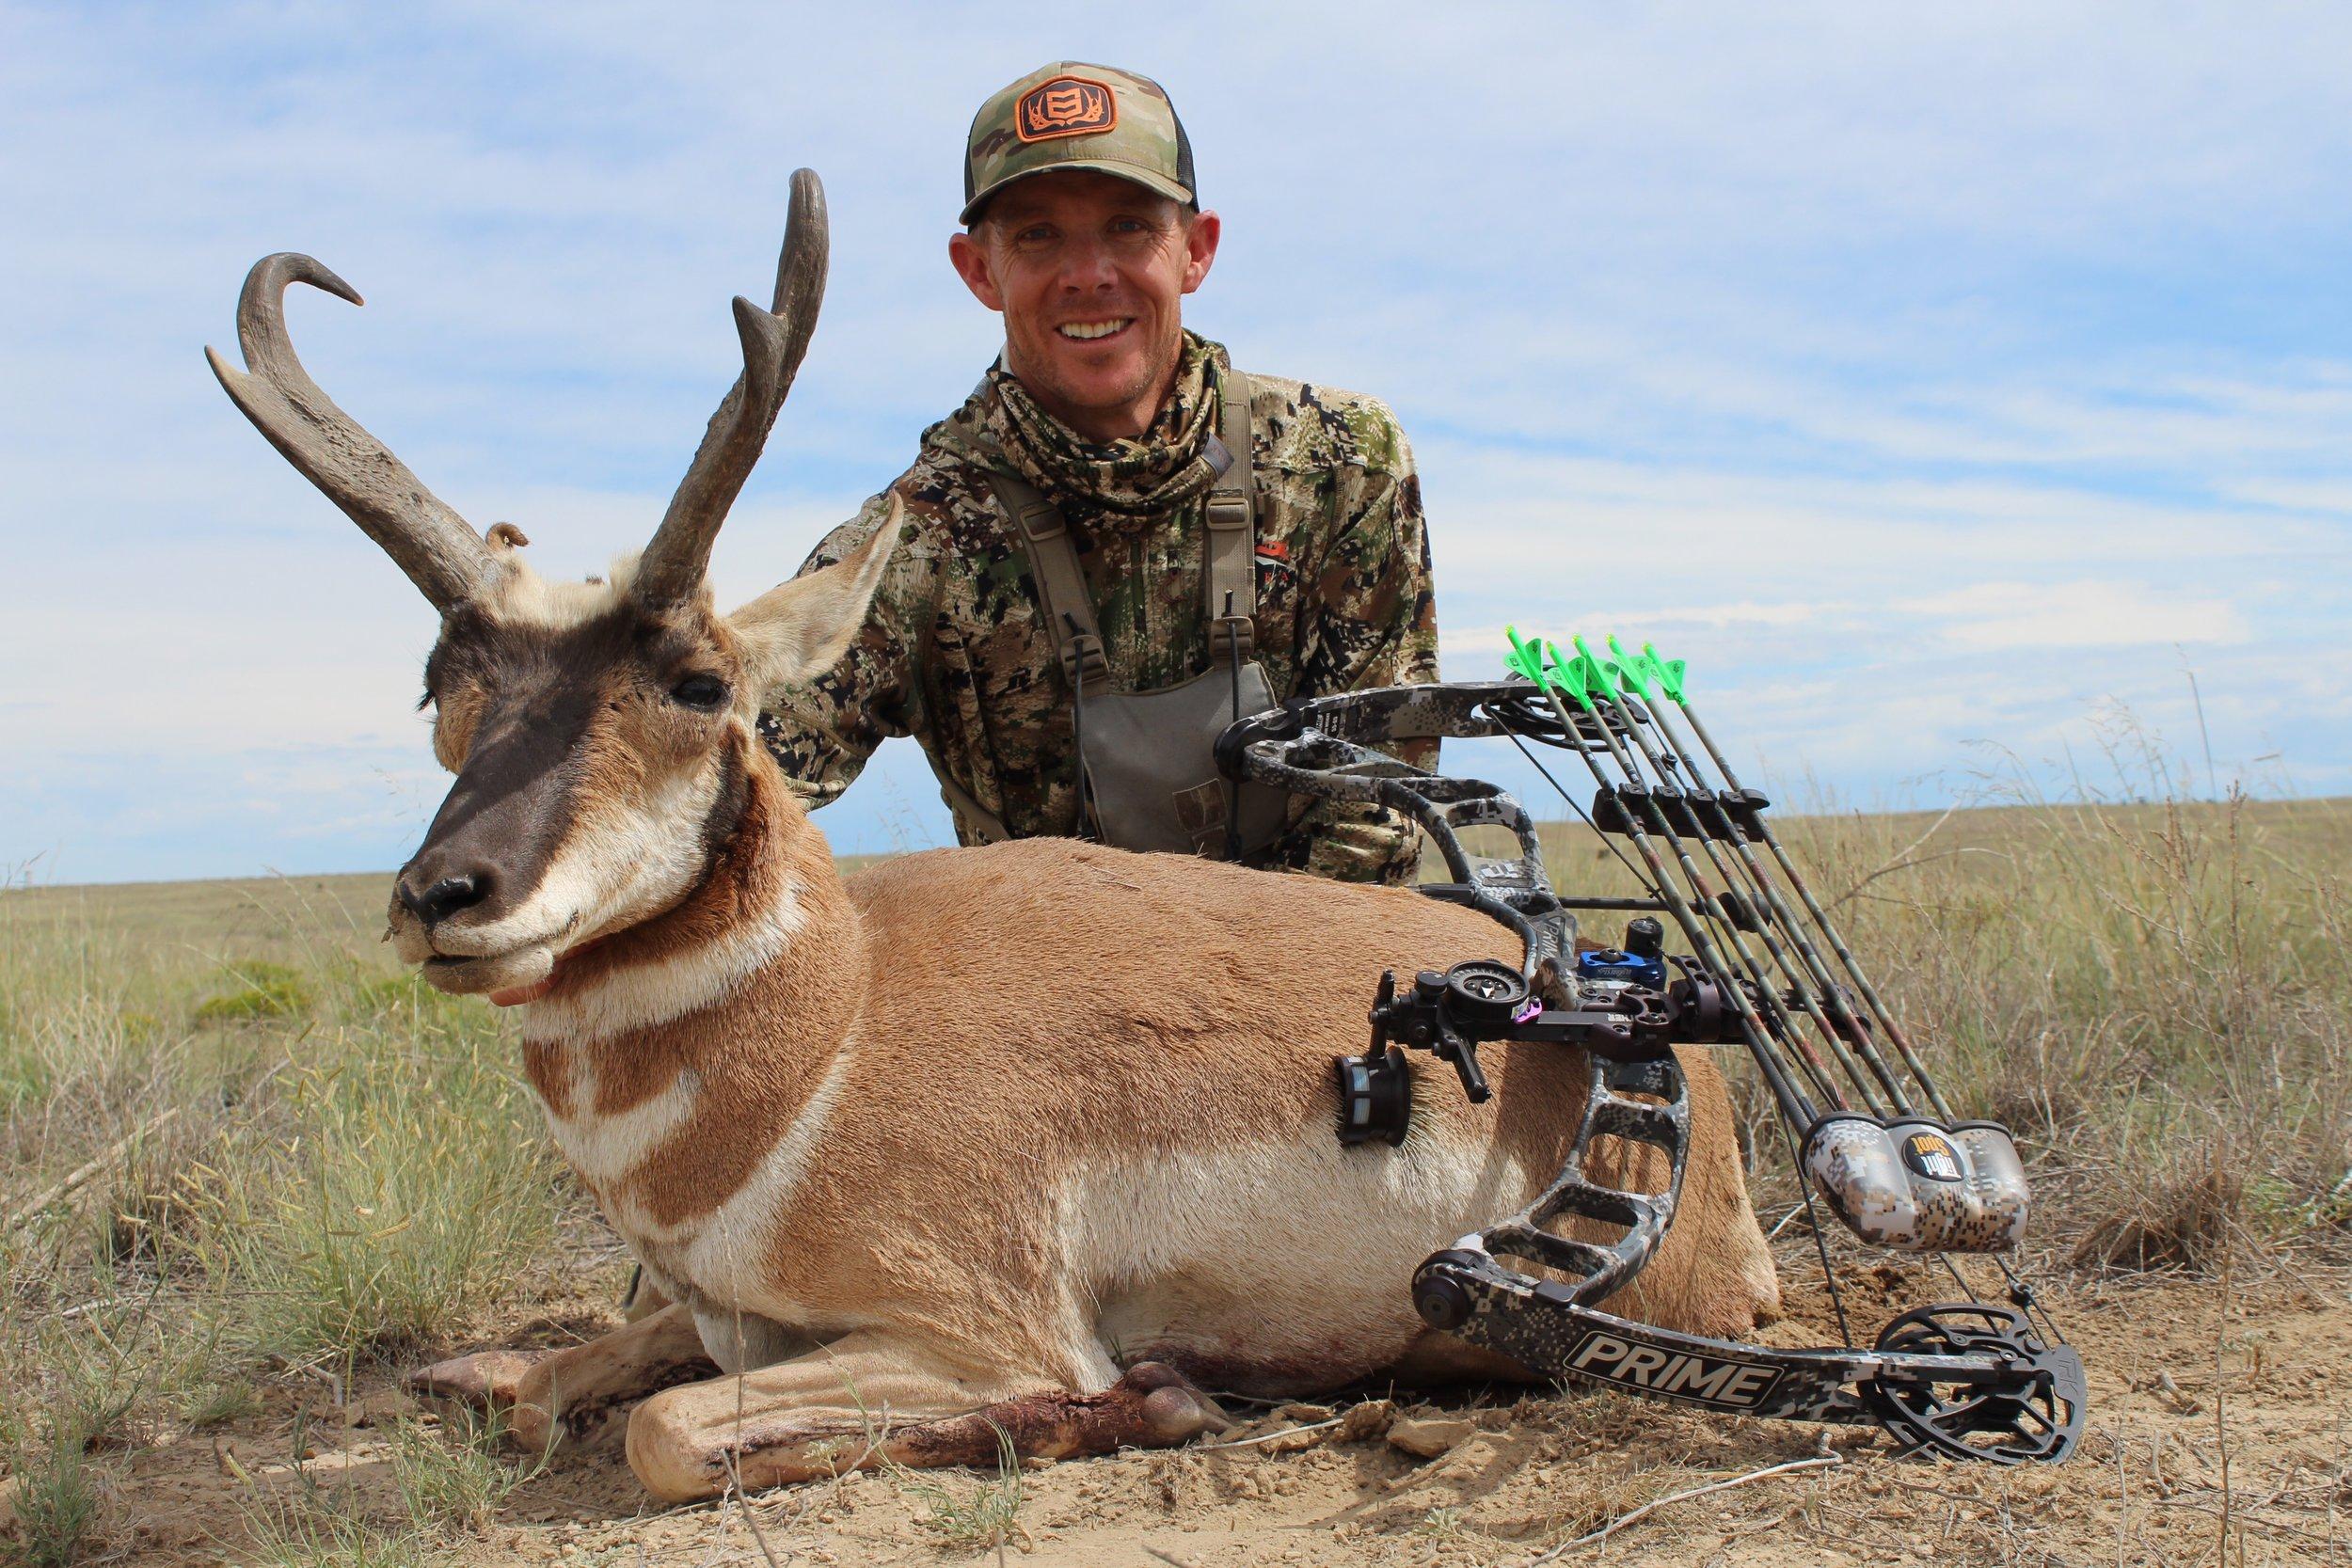 Jace_Bauserman_Antelope_Hunting